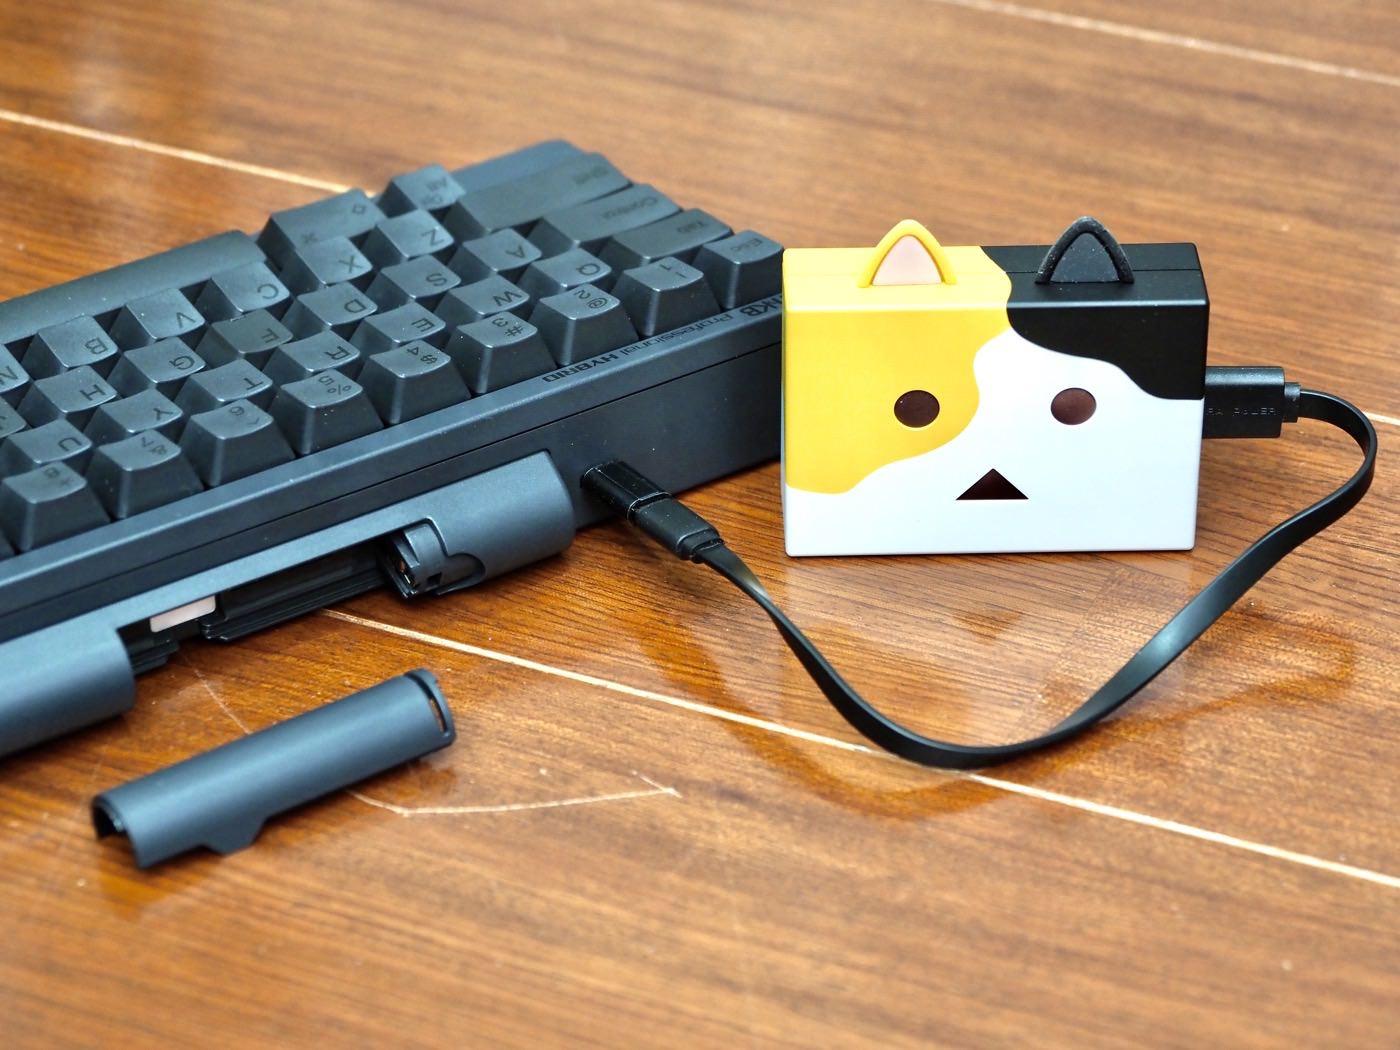 Happy hacking keyboard hybrid type s 00013